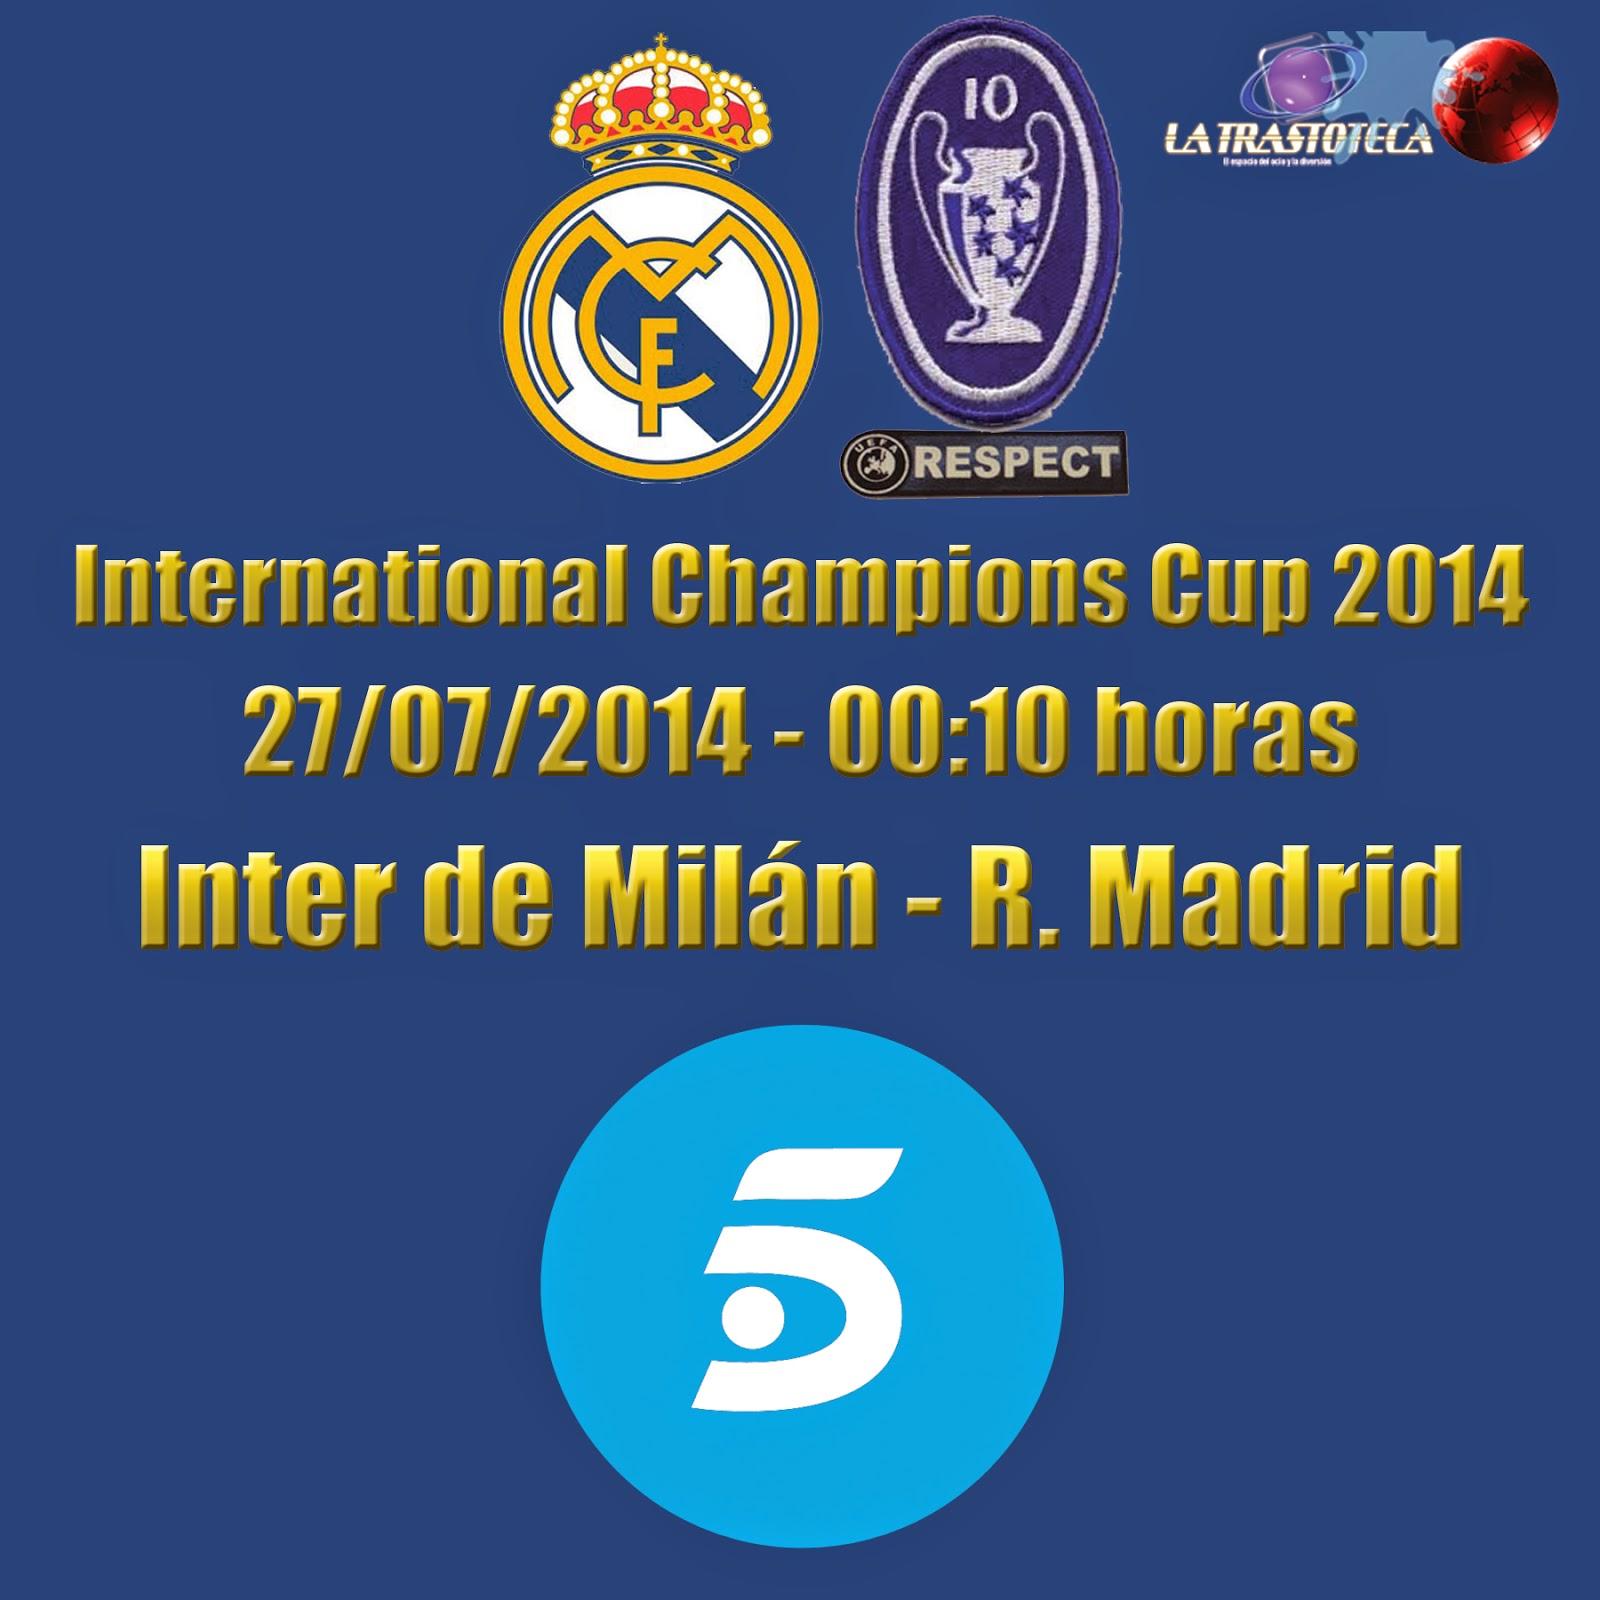 Inter de Milán - Real Madrid. IInternational Champions Cup 2014 - 27/07/2014 - 00:10 - Tele5